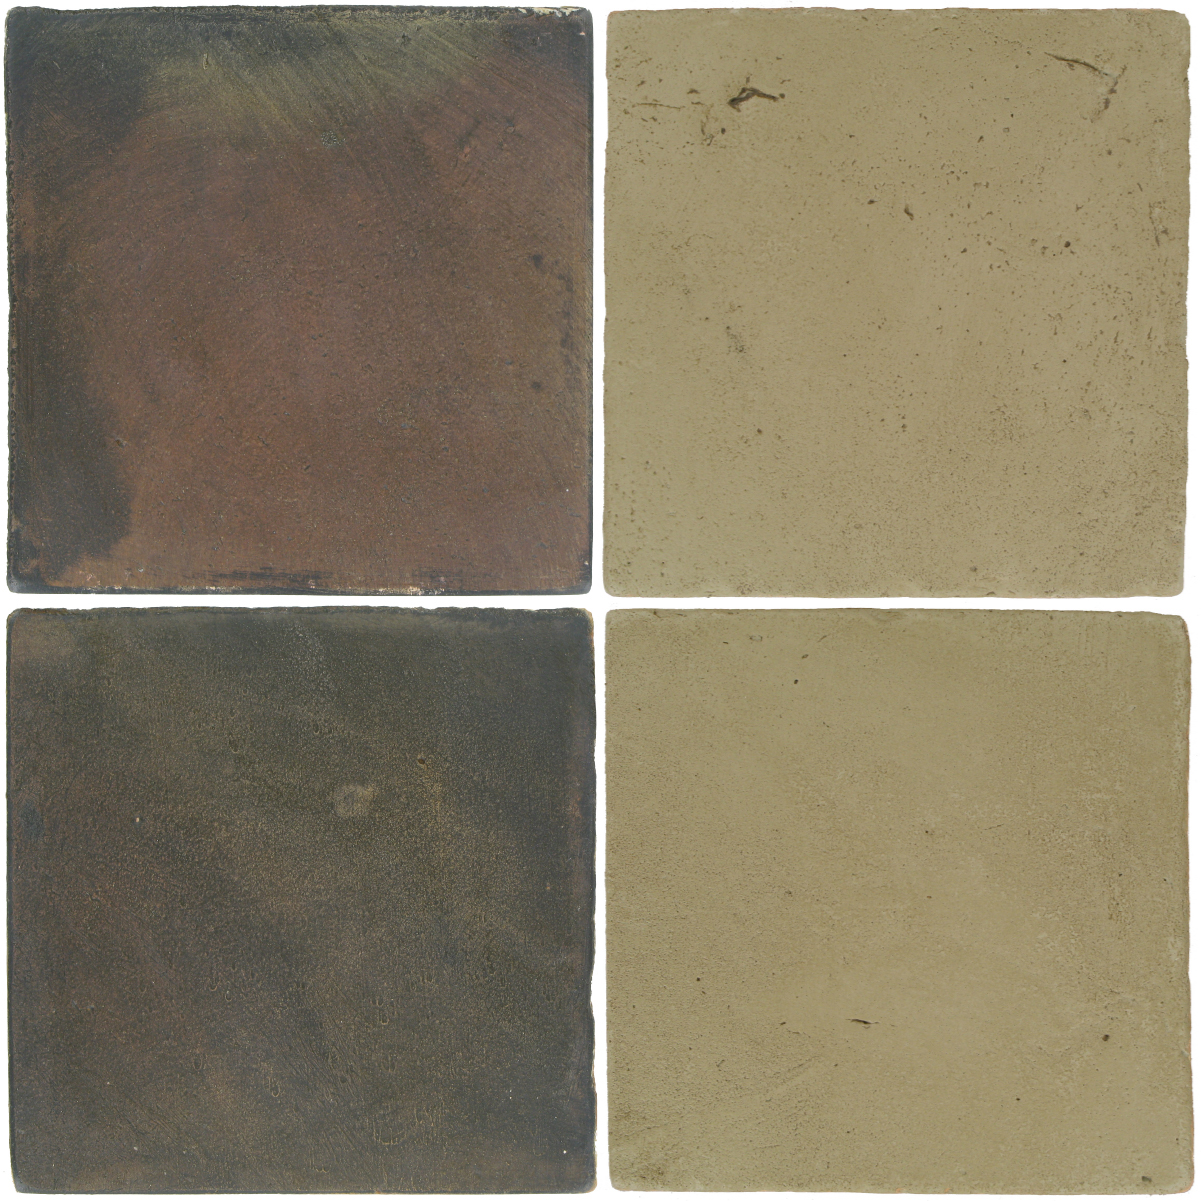 Pedralbes Antique Terracotta  2 Color Combinations  OHS-PSTG Terra Grey + VTG-PGDW Dirty W.